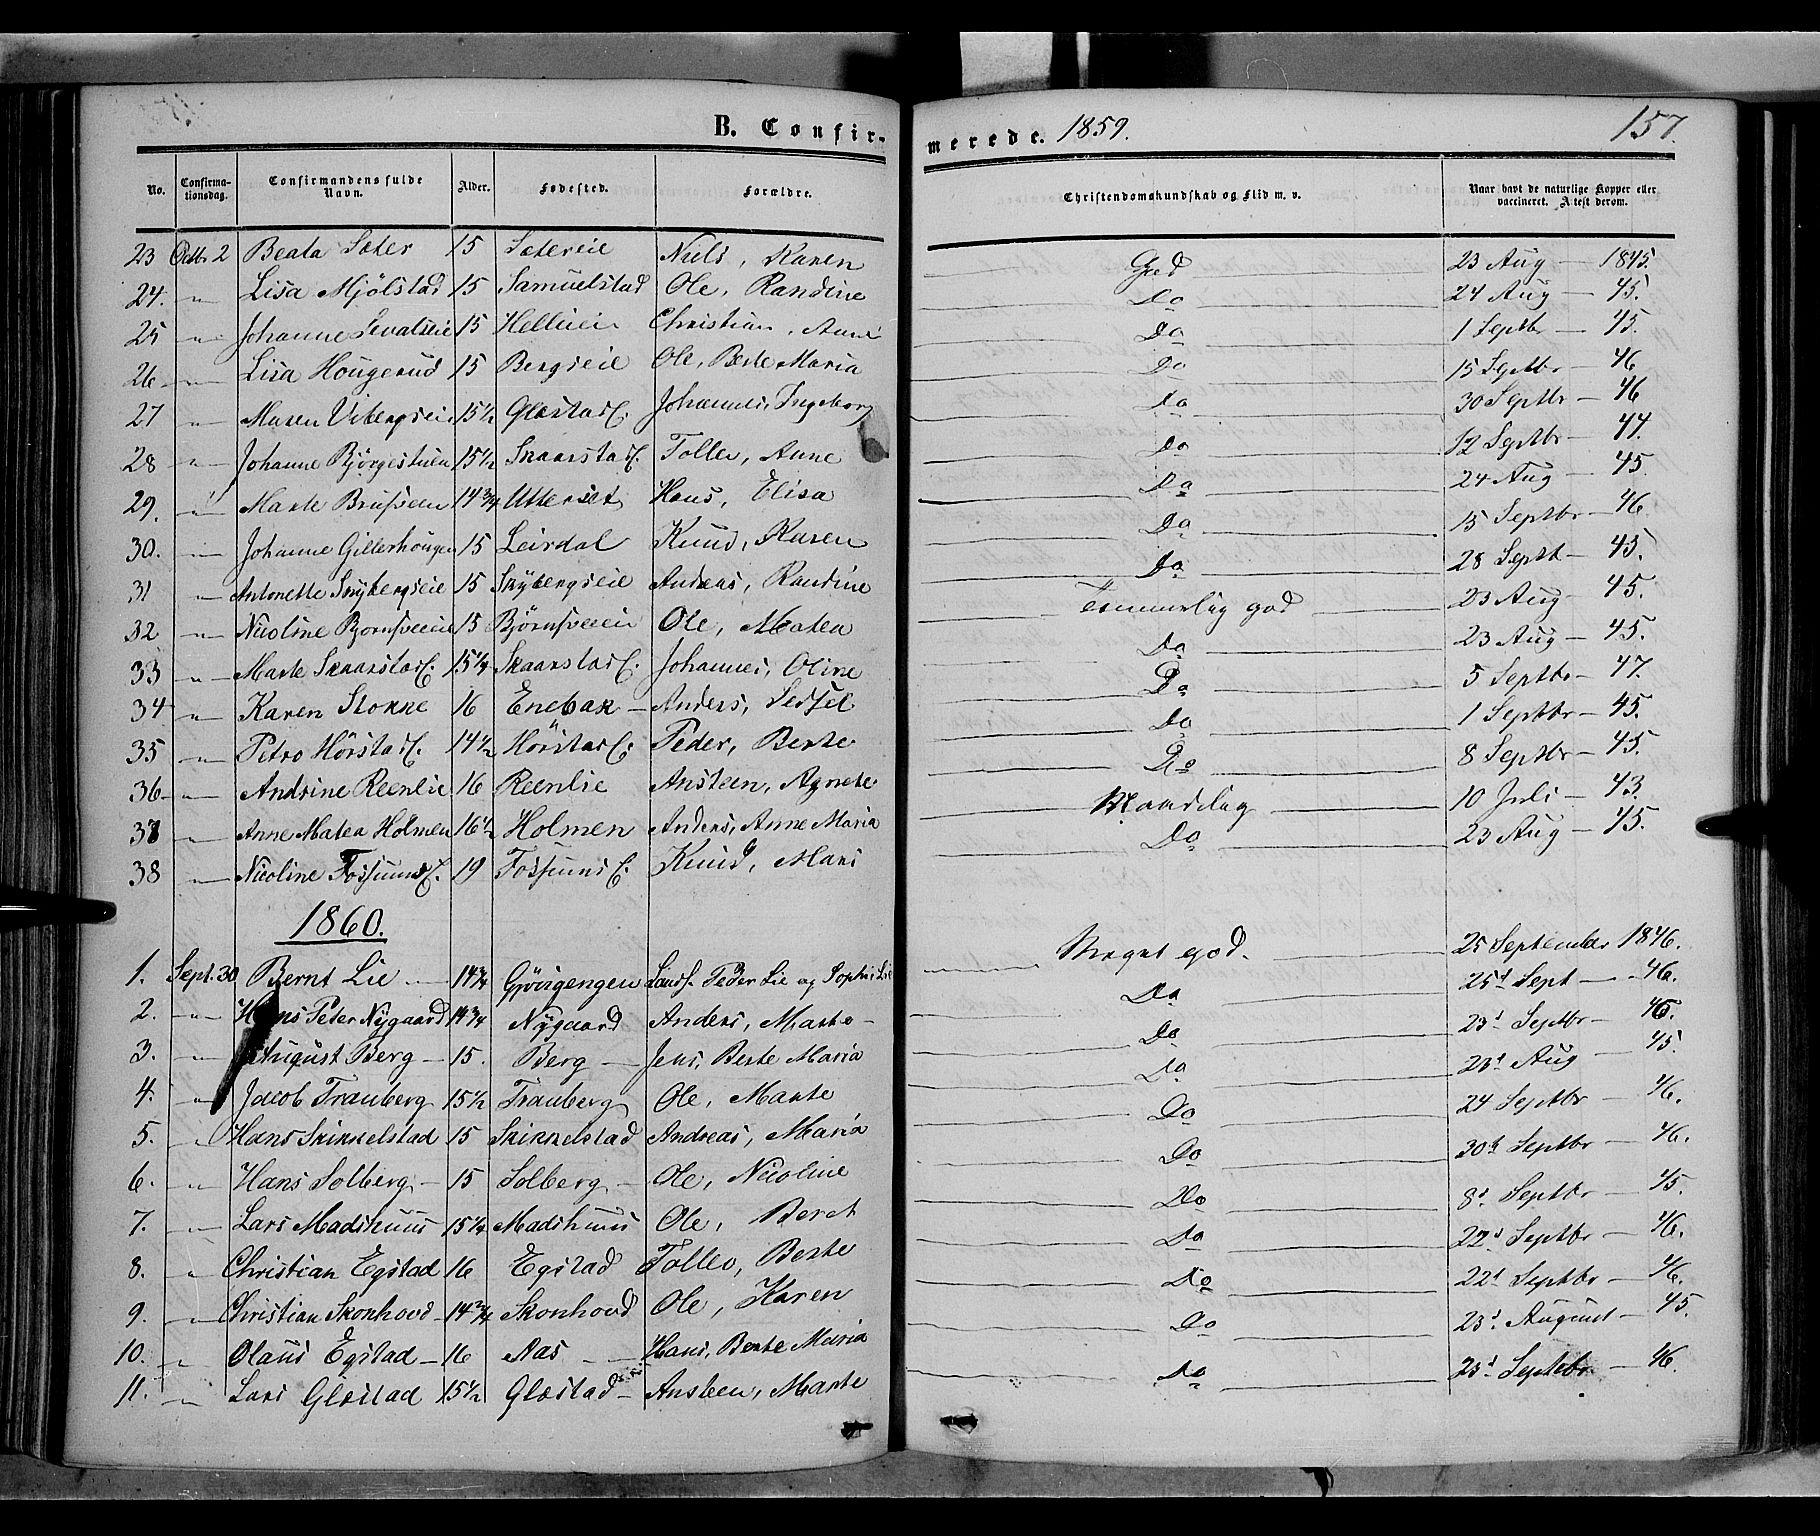 SAH, Vardal prestekontor, H/Ha/Haa/L0006: Ministerialbok nr. 6, 1854-1866, s. 157